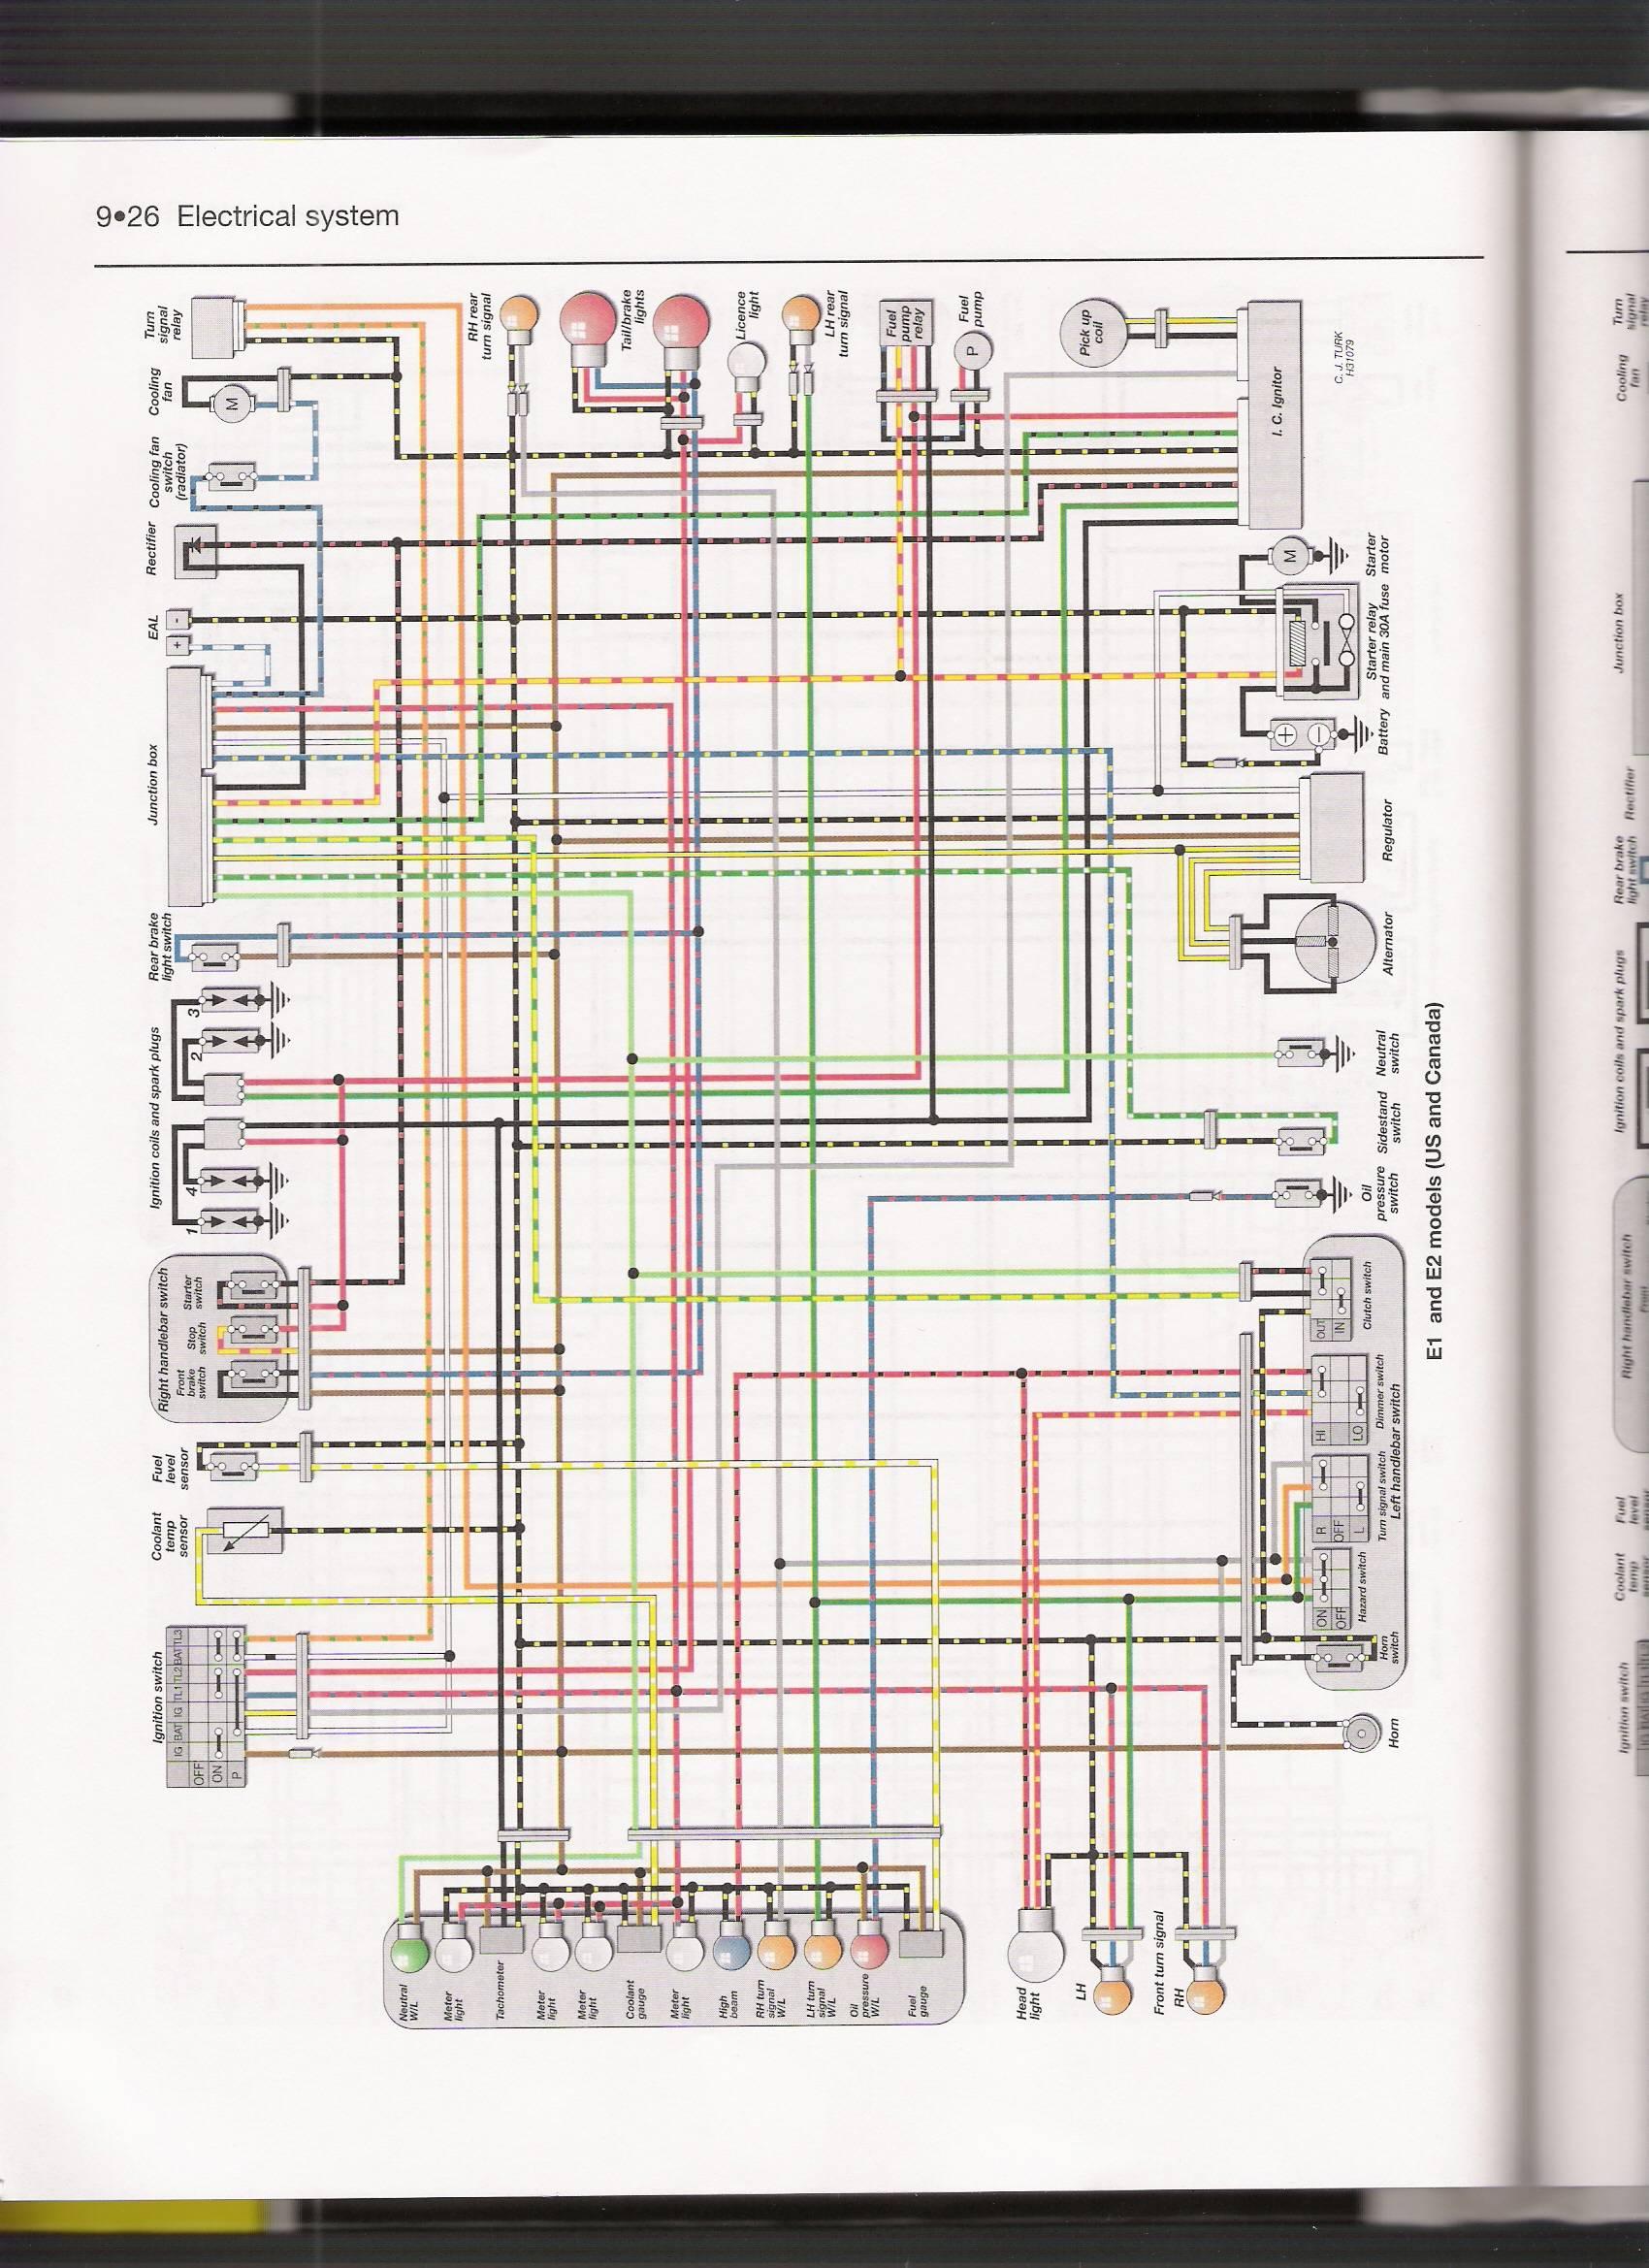 2006 Kawasaki Ninja 650r Wiring Diagram